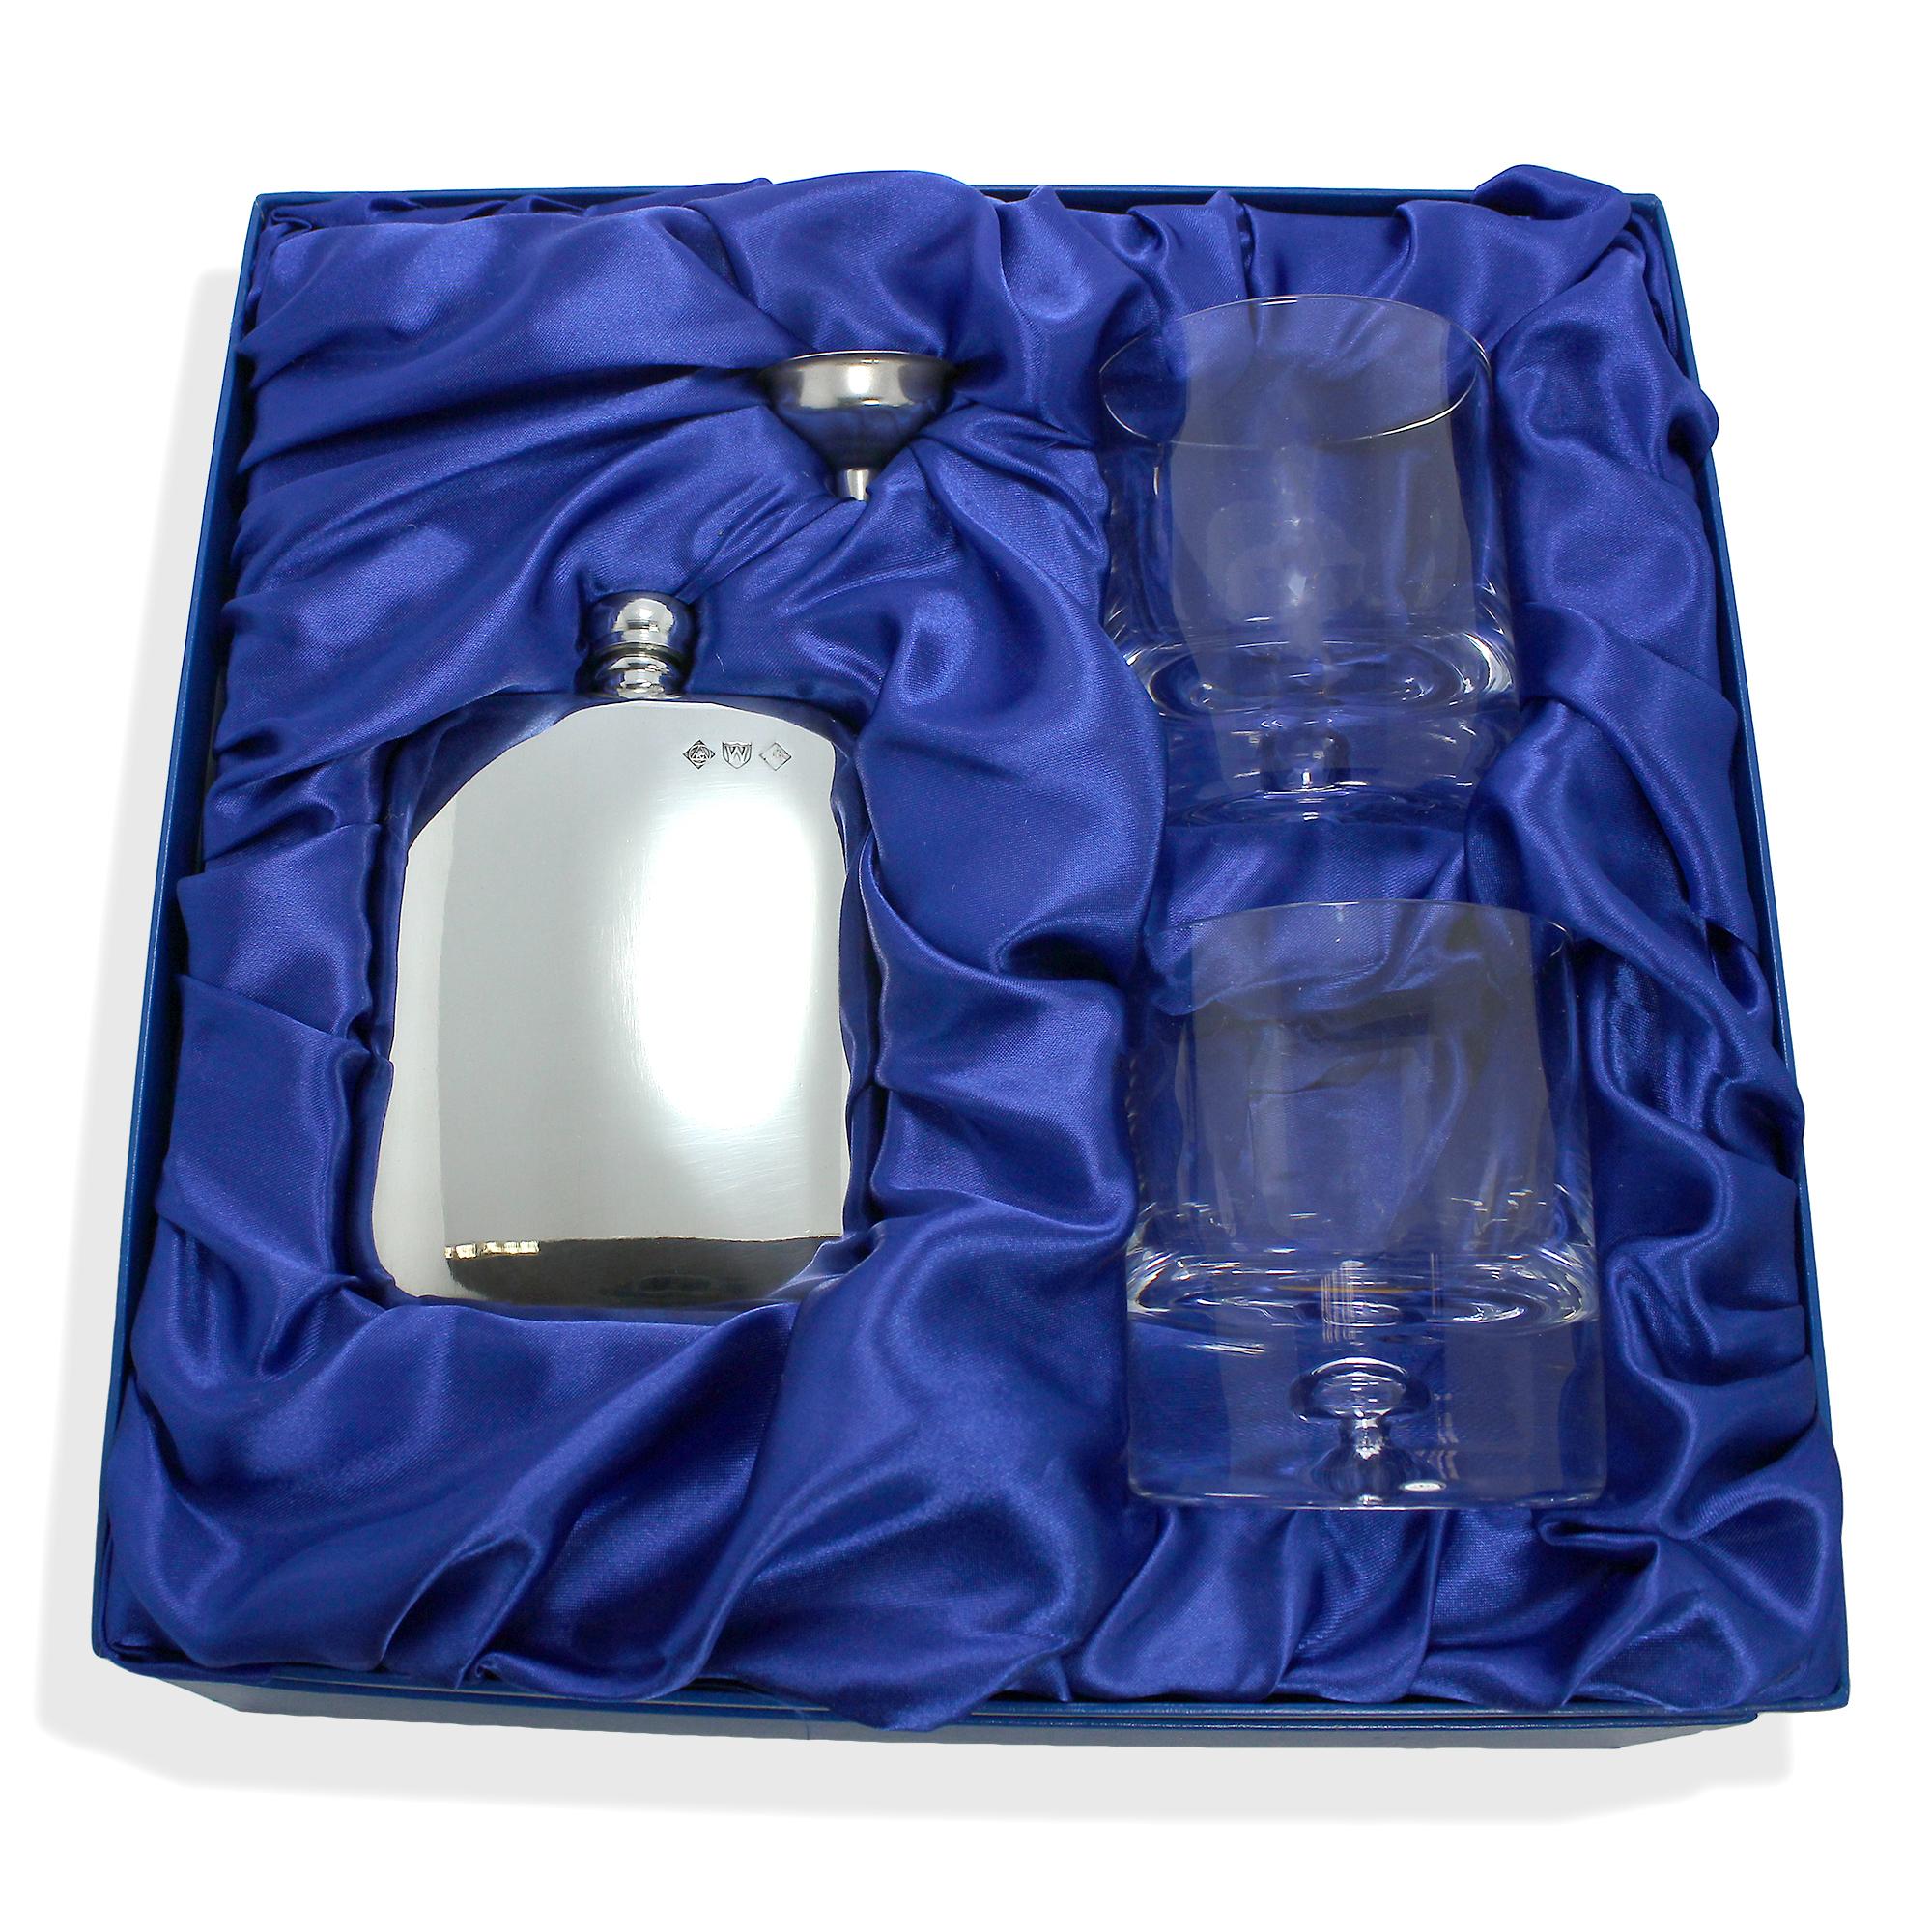 An image of 6oz Pewter Flask 2 8oz Engravable Bubble Based Tumbler Set